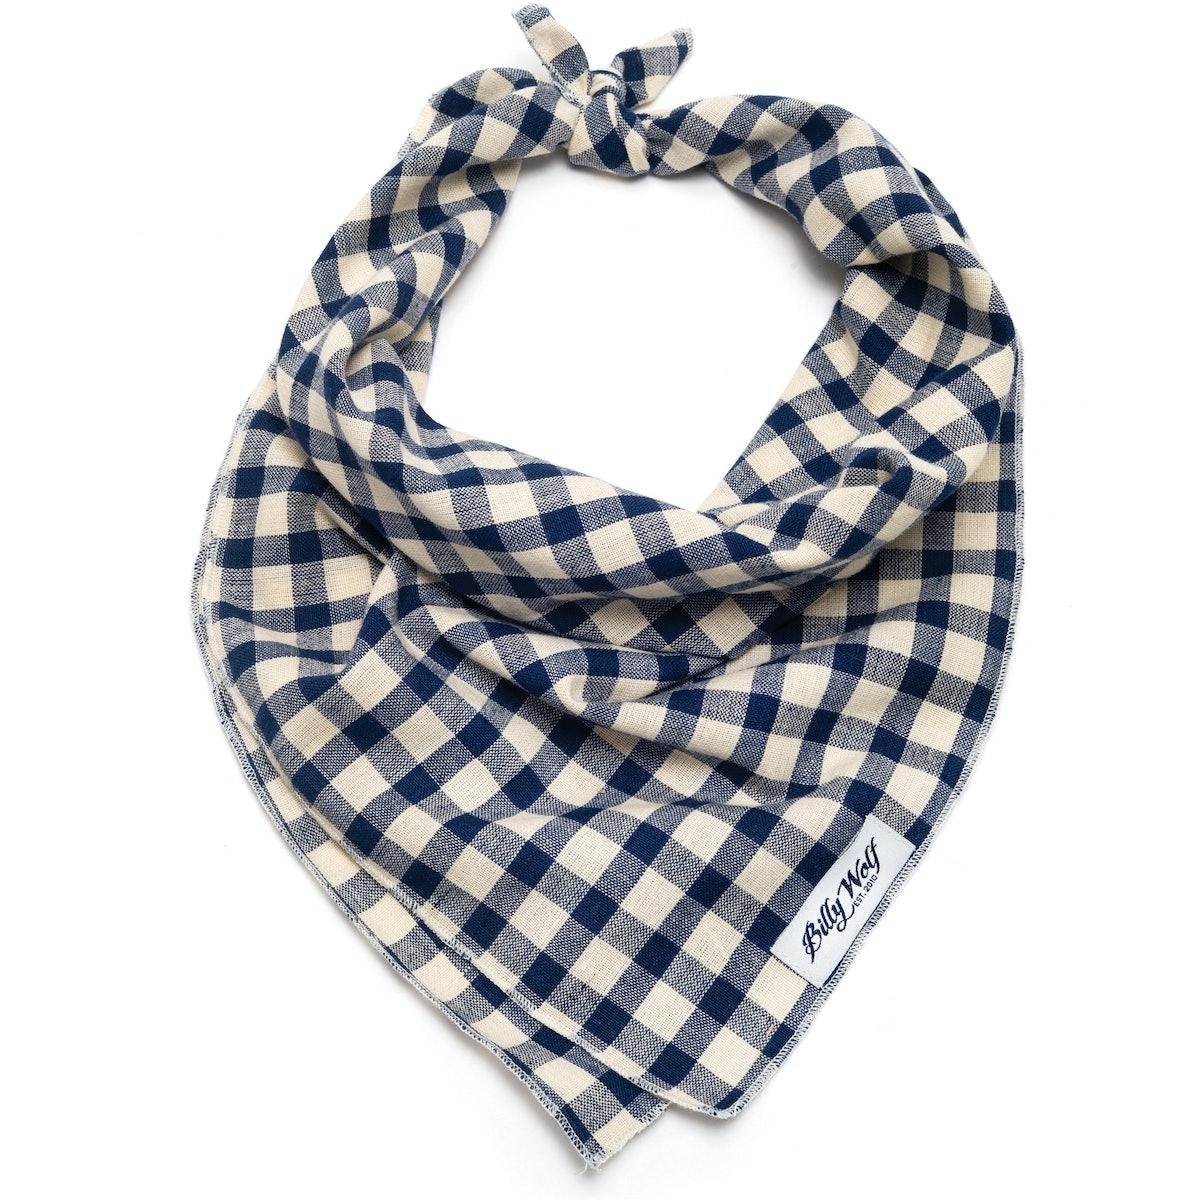 Billy Wolf scarf